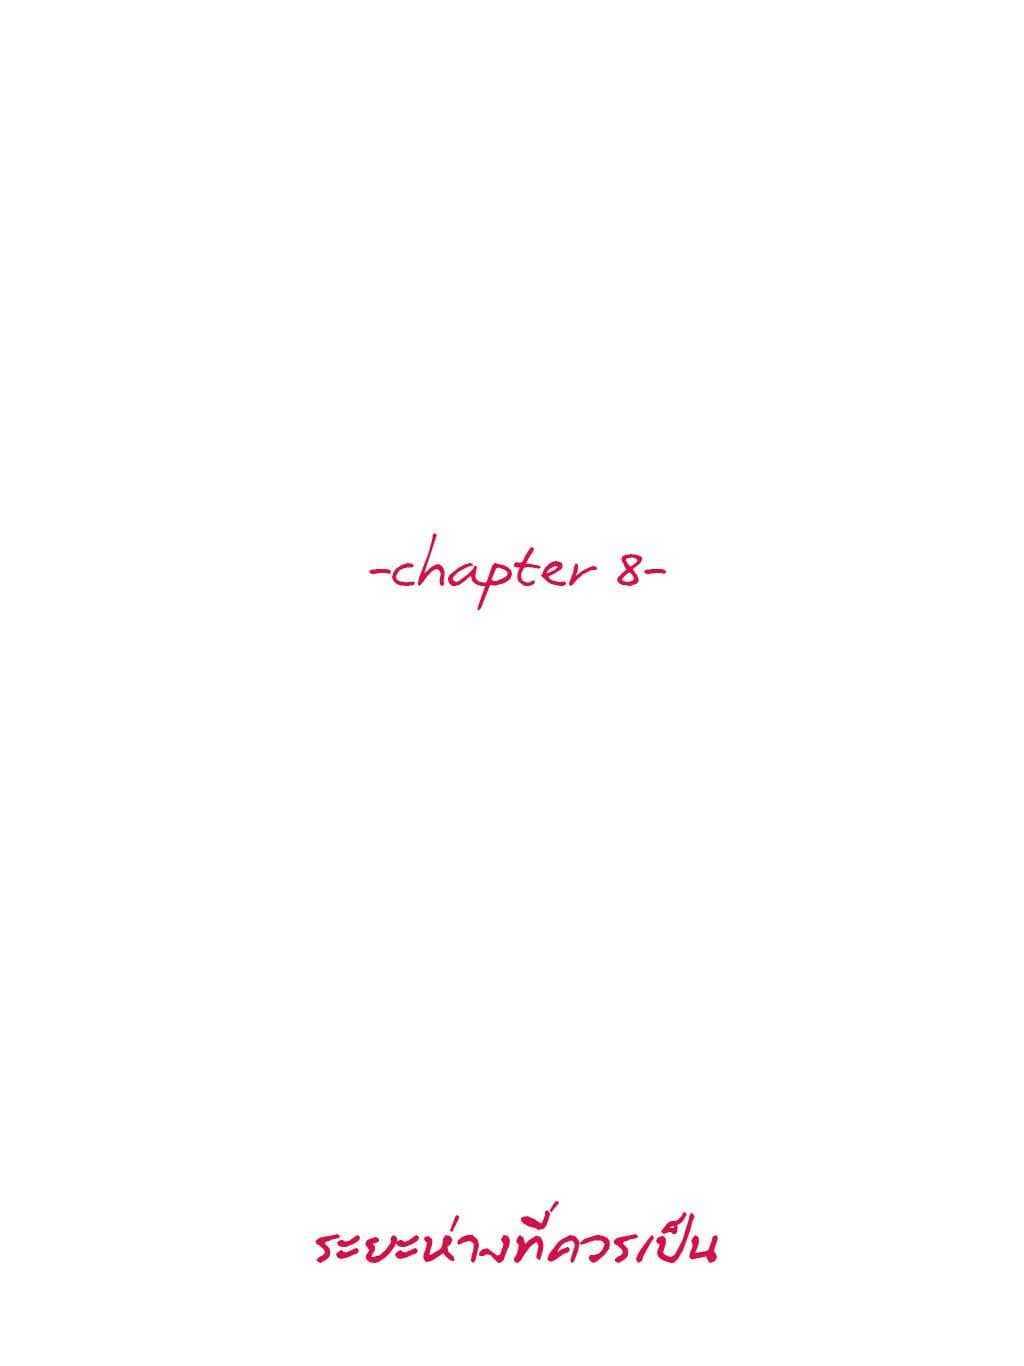 chapter 8 - ระยะห่างที่ควรเป็น